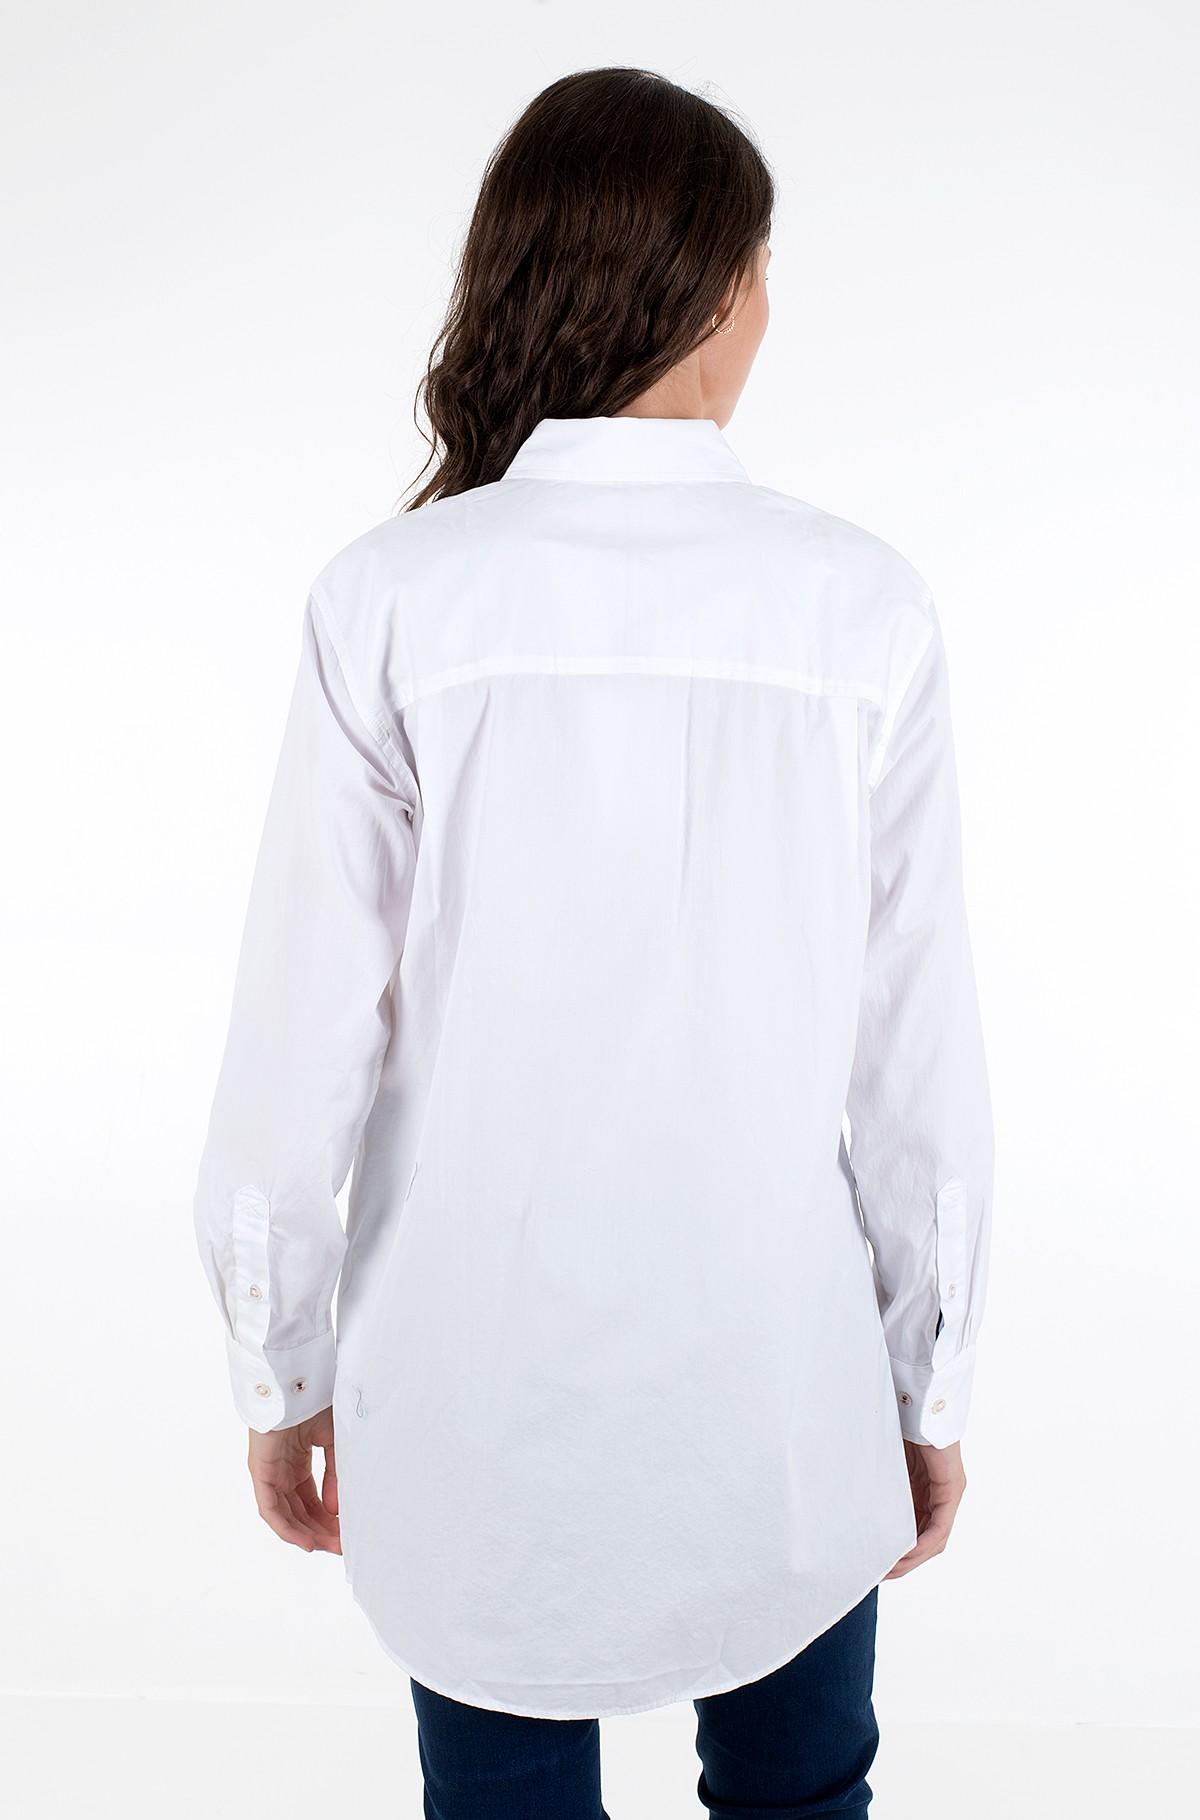 Marškiniai ICON TEDDY SHIRT LS W5-full-2